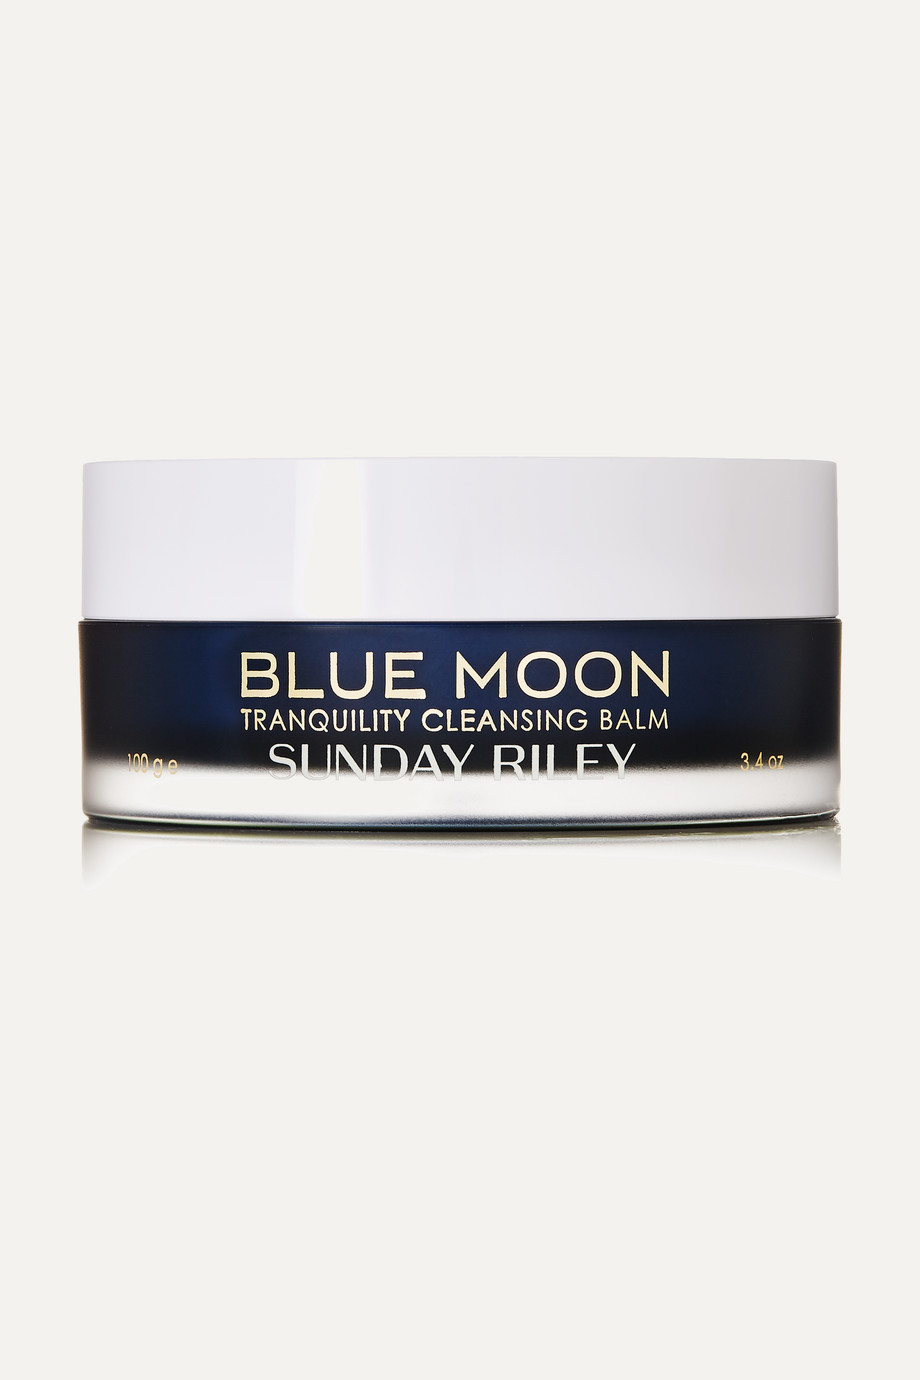 Sunday Riley Blue Moon Tranquility Cleansing Balm, 100 ml – Reinigungsbalsam